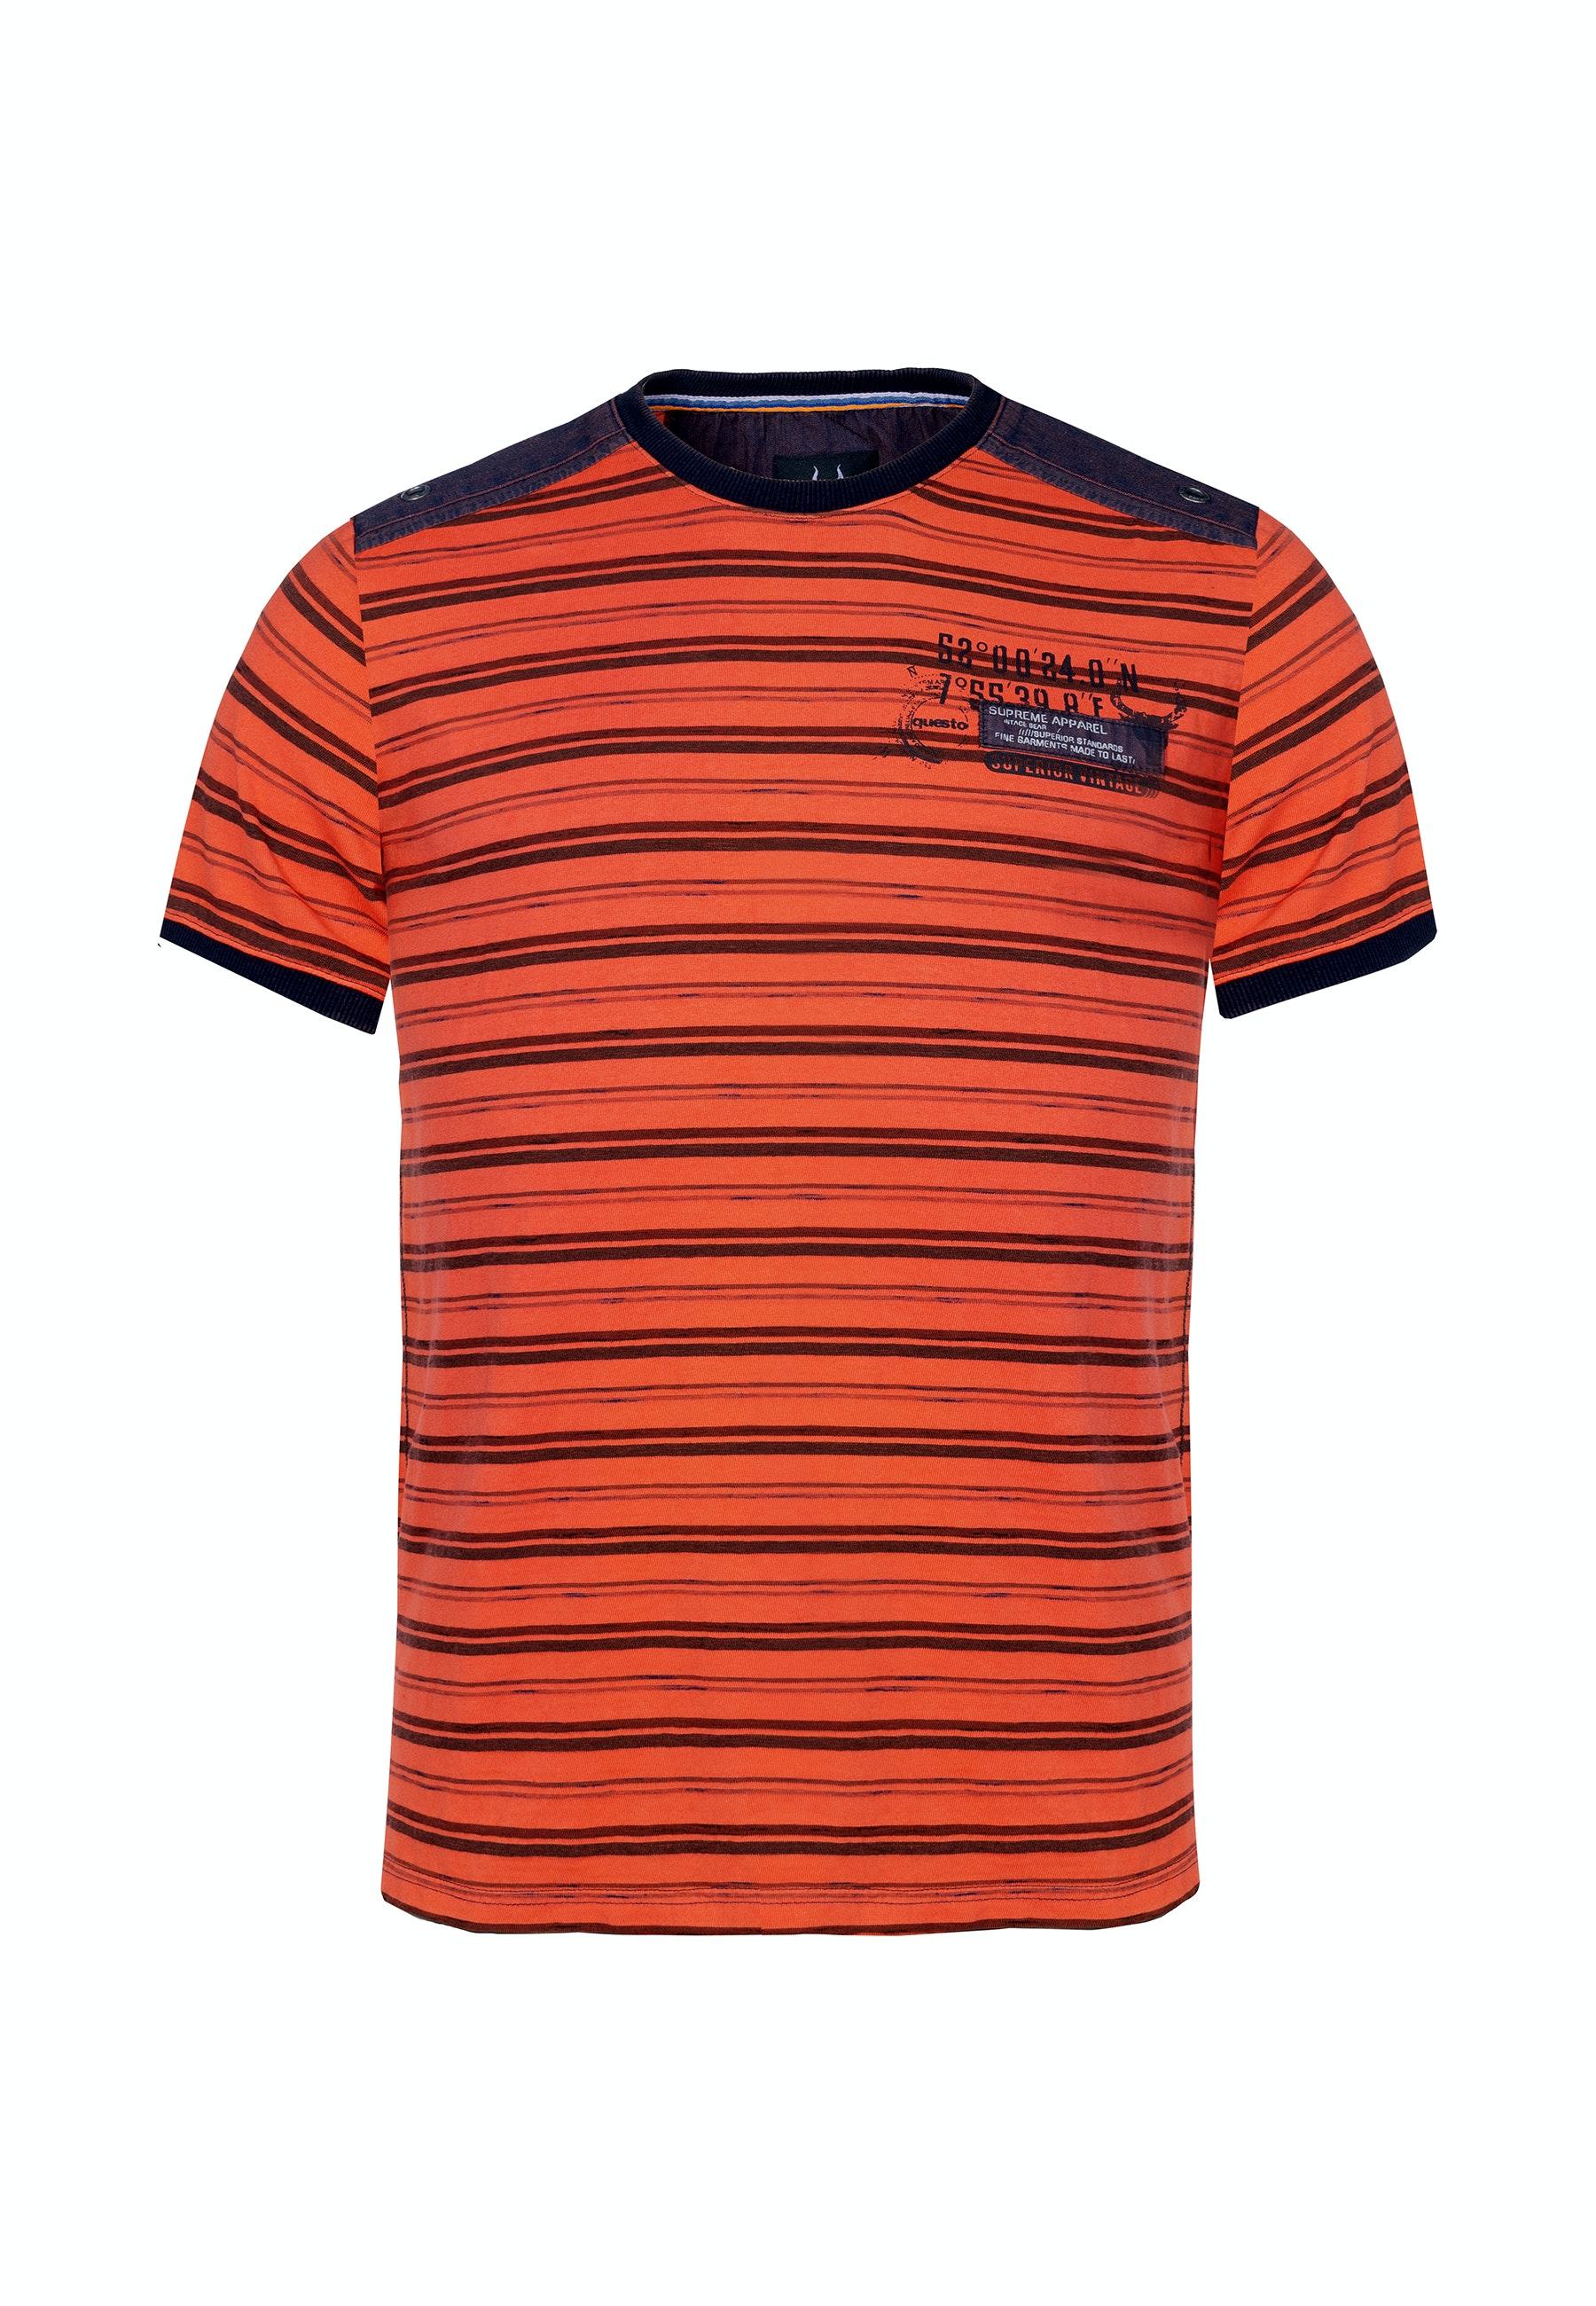 Questo T-Shirt Diego